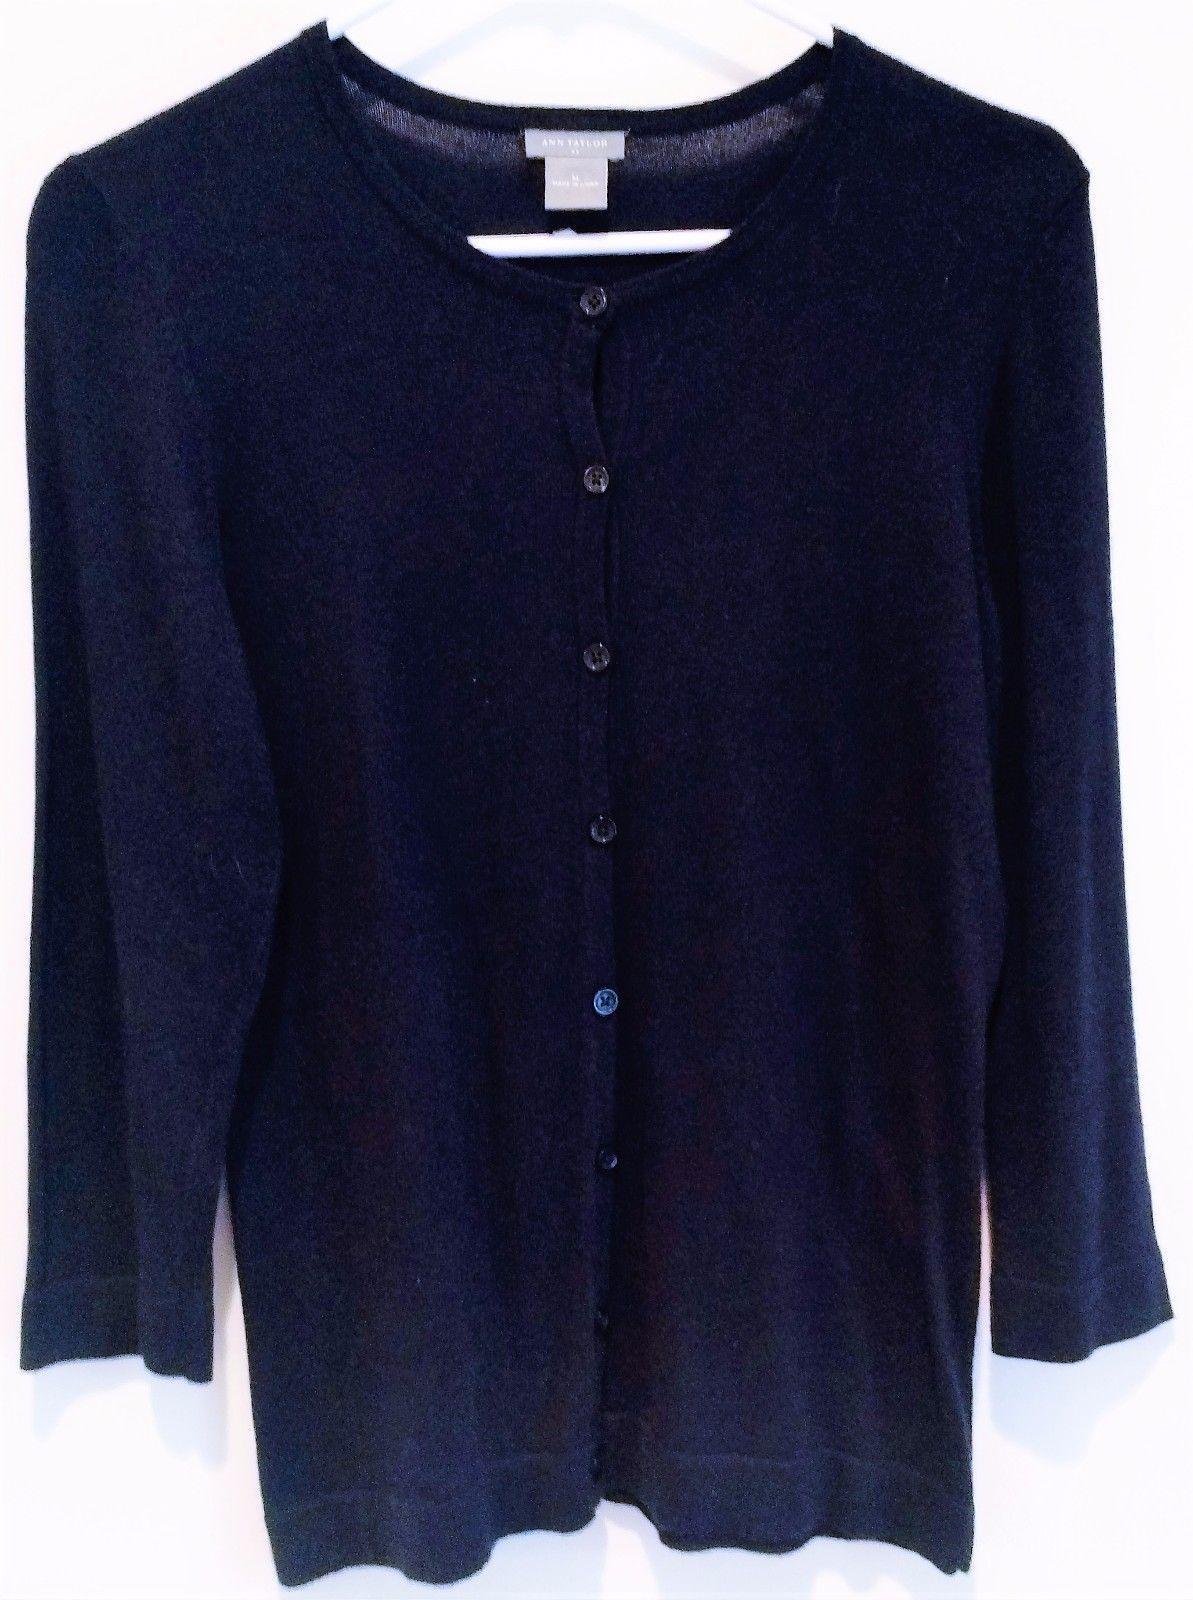 Ann Taylor Navy Blue 3/4 Sleeve Lightweight Cardigan Sweater Size ...